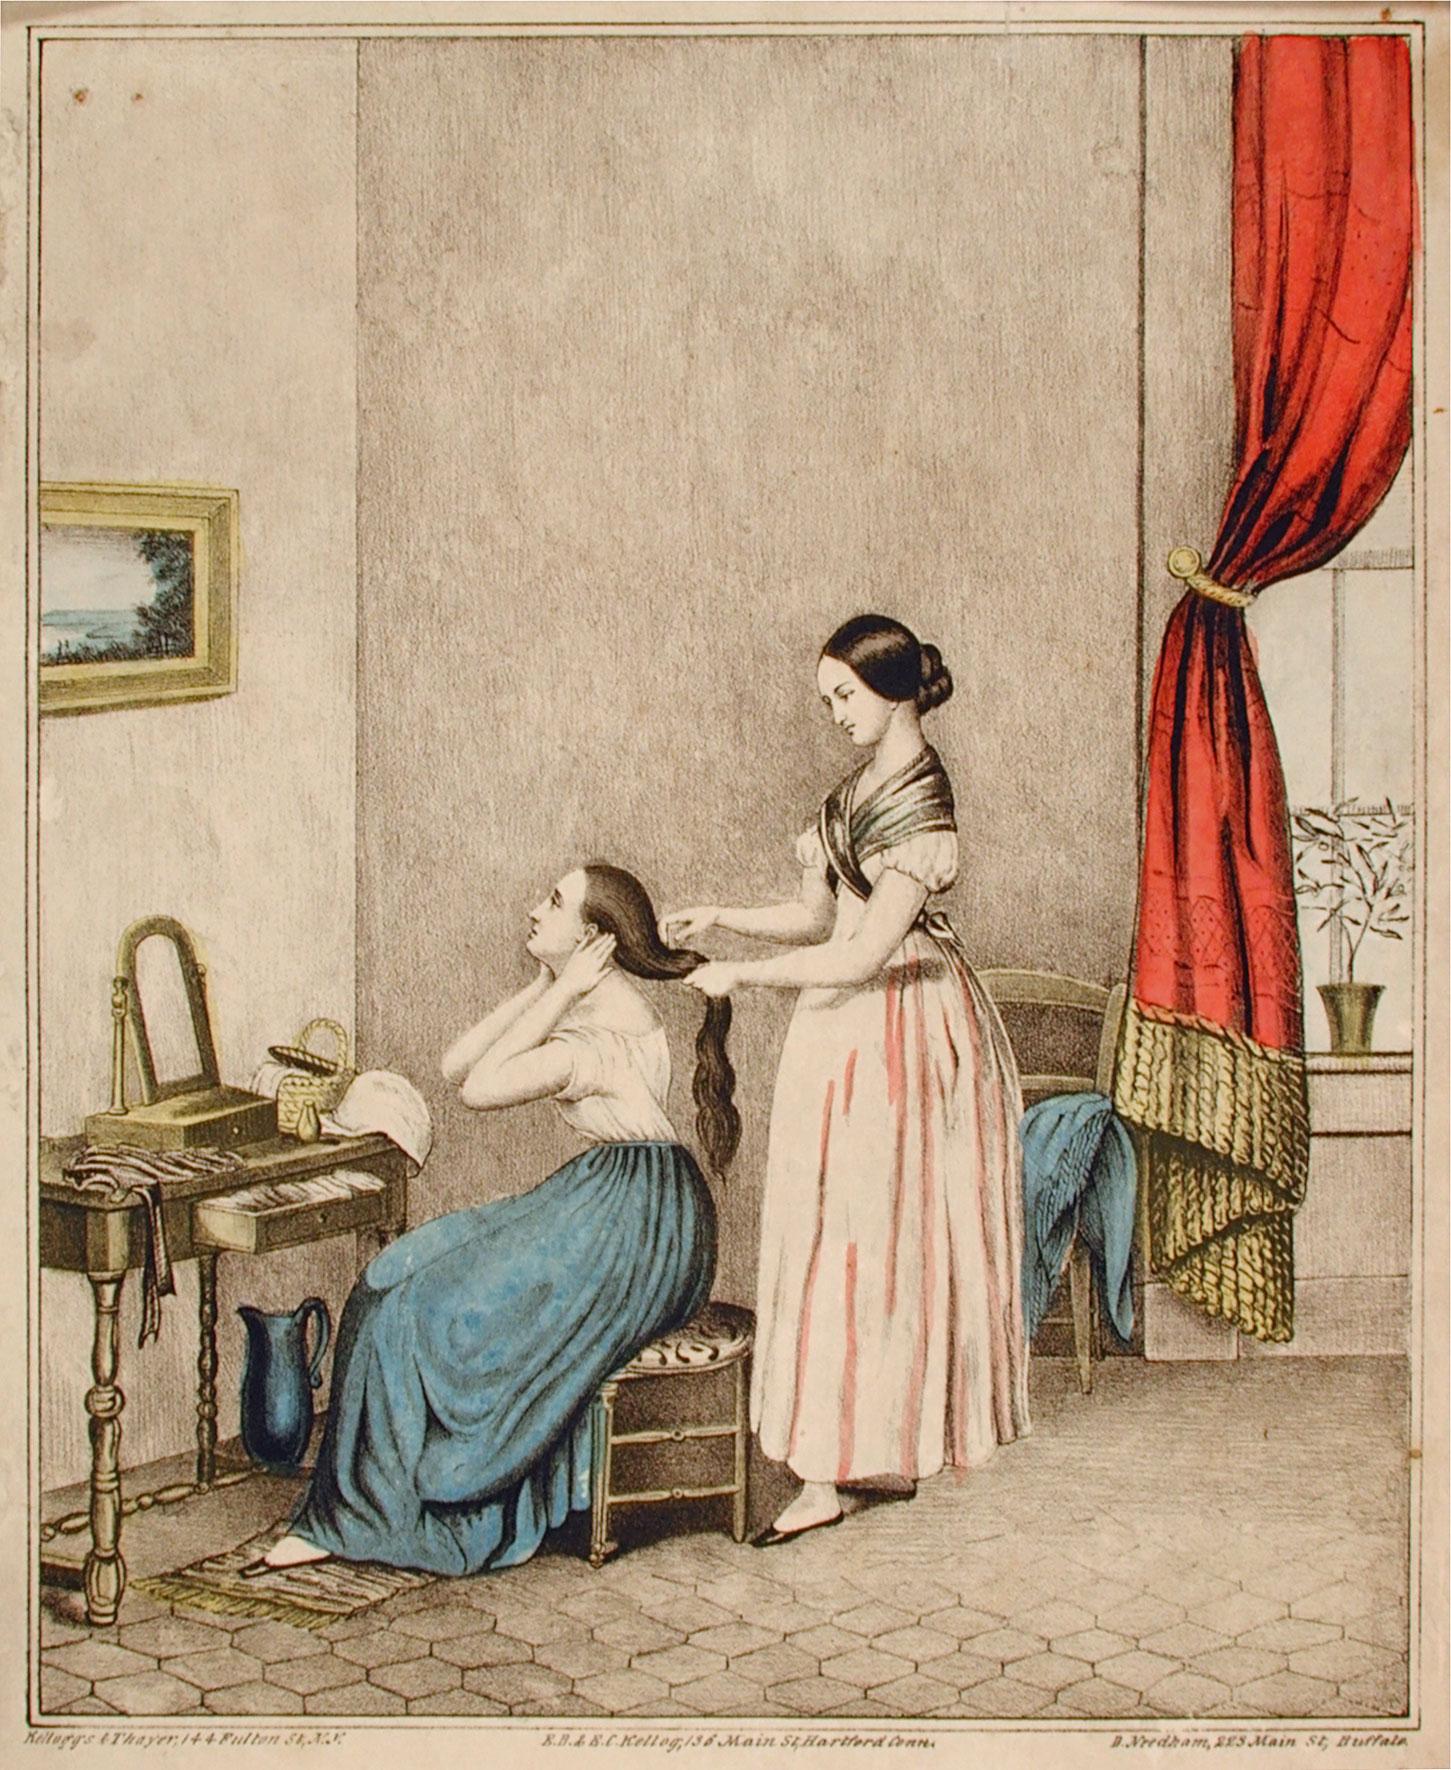 The Toilet, E. B. & E. C. Kellogg, Hartford, Connecticut, 1845